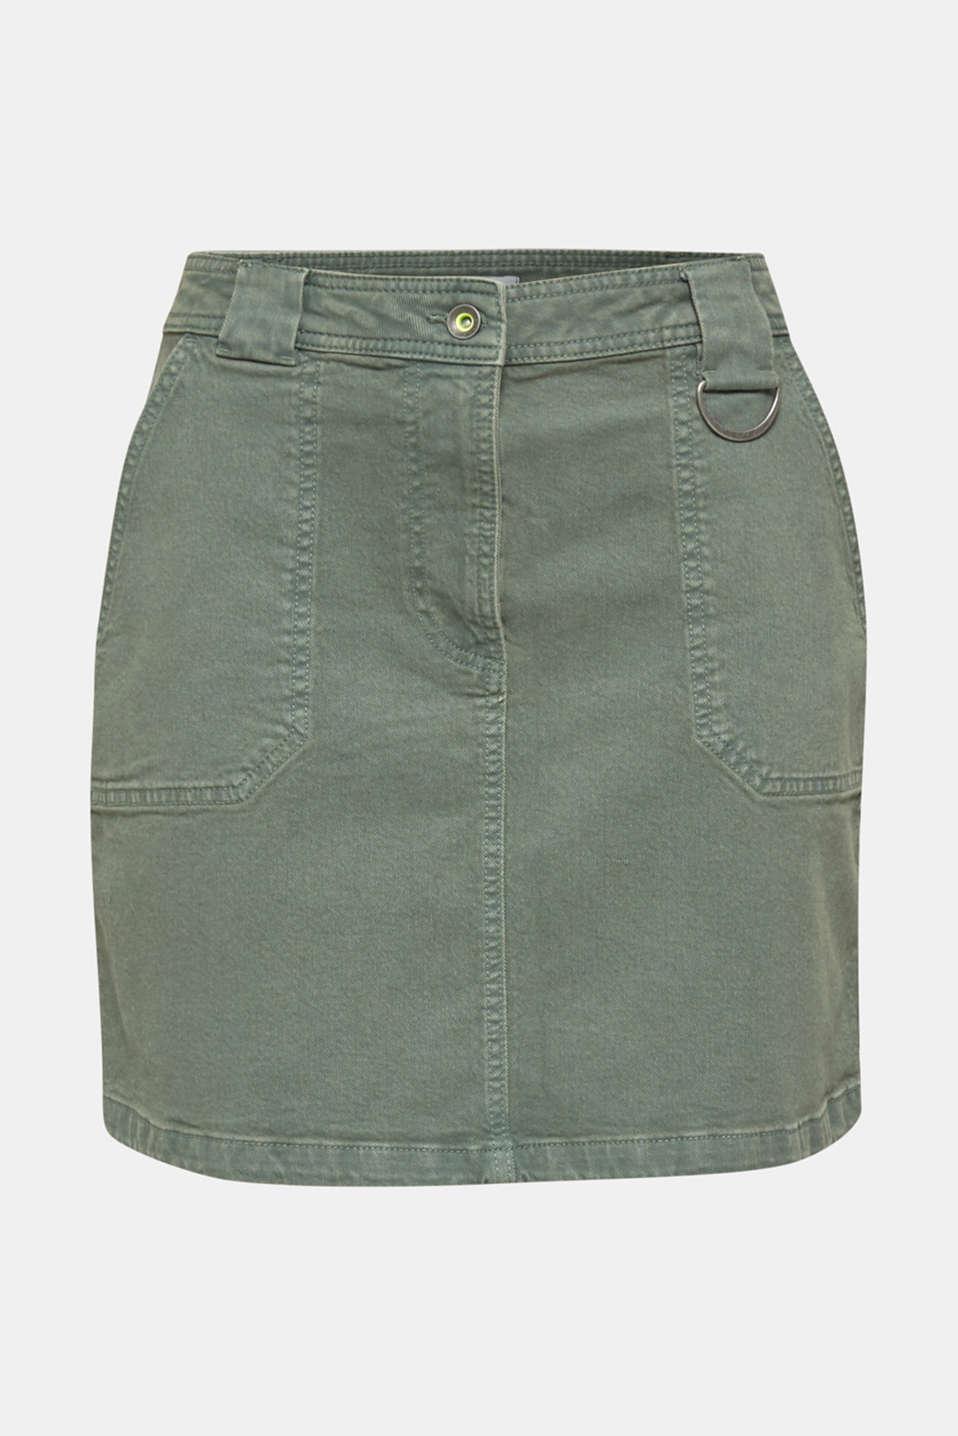 Denim skirt with pockets, KHAKI GREEN, detail image number 7